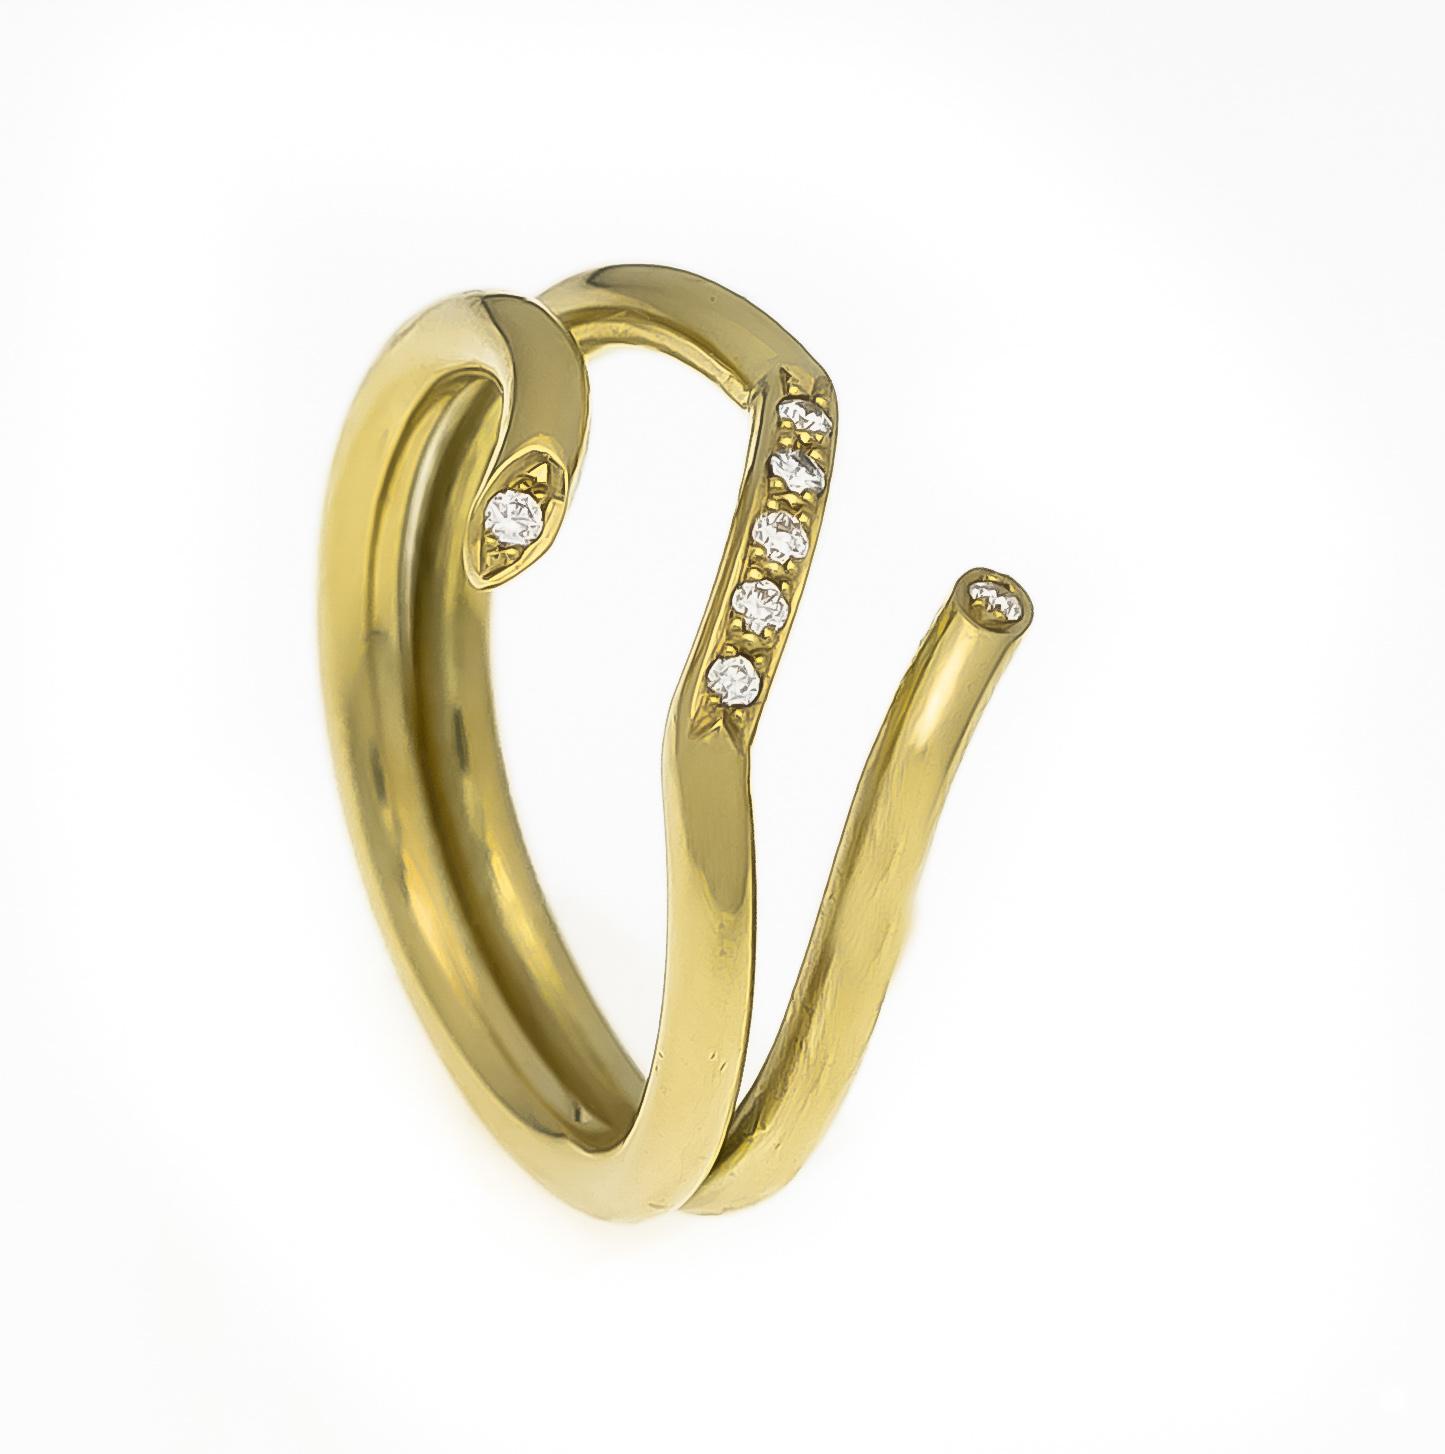 Lot 43 - Brillant-Ring GG 585/000 mit 7 Brillanten, zus. 0,11 ct W/SI, RG 63, 8,9 gBrillant ring GG 585/000